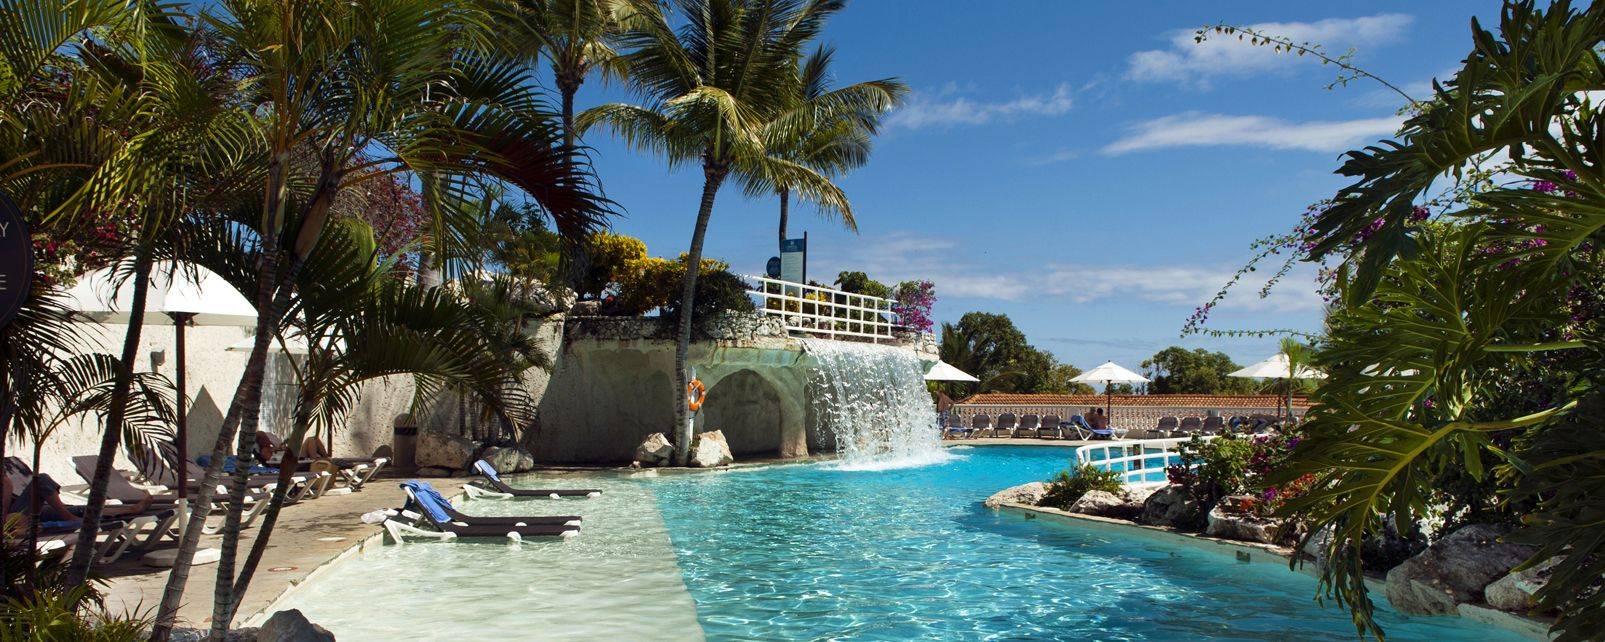 Hôtel Cofresi Palm Beach